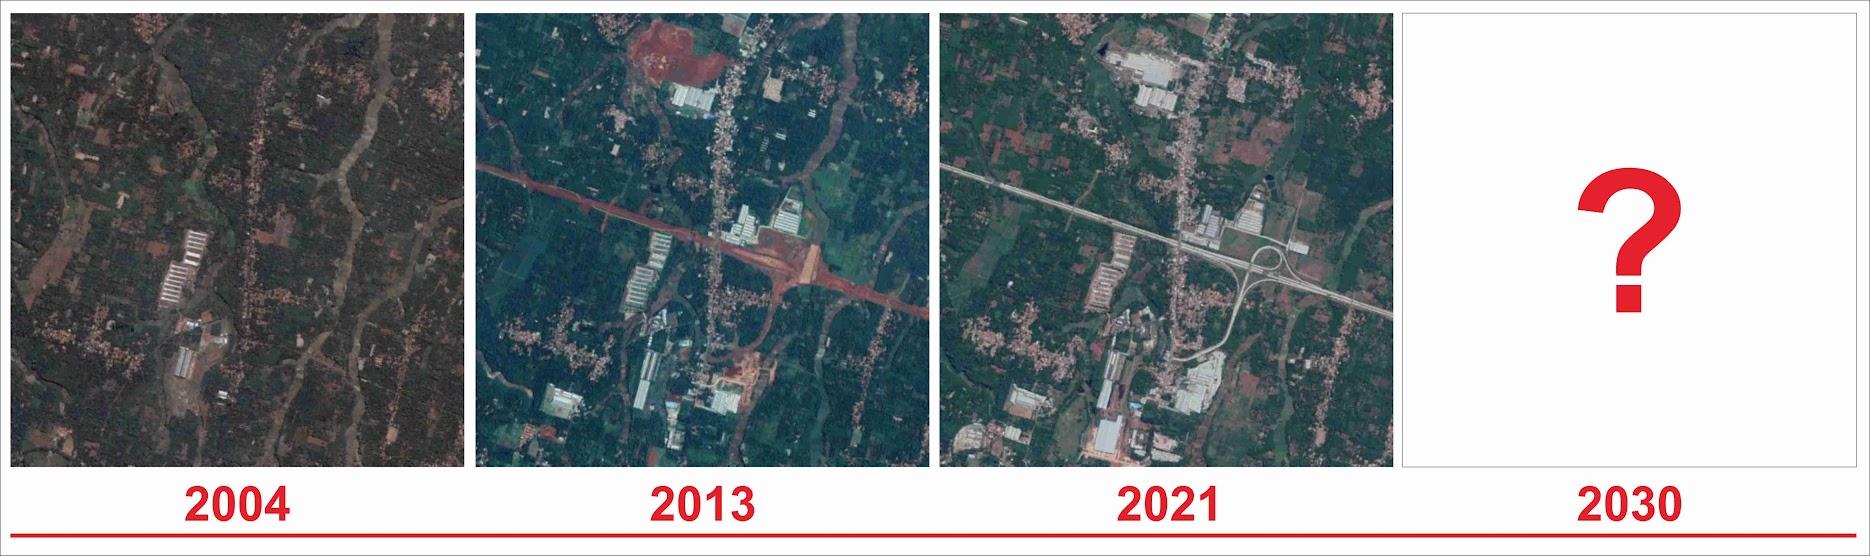 Perubahan tutupan lahan di Kalijati Subang